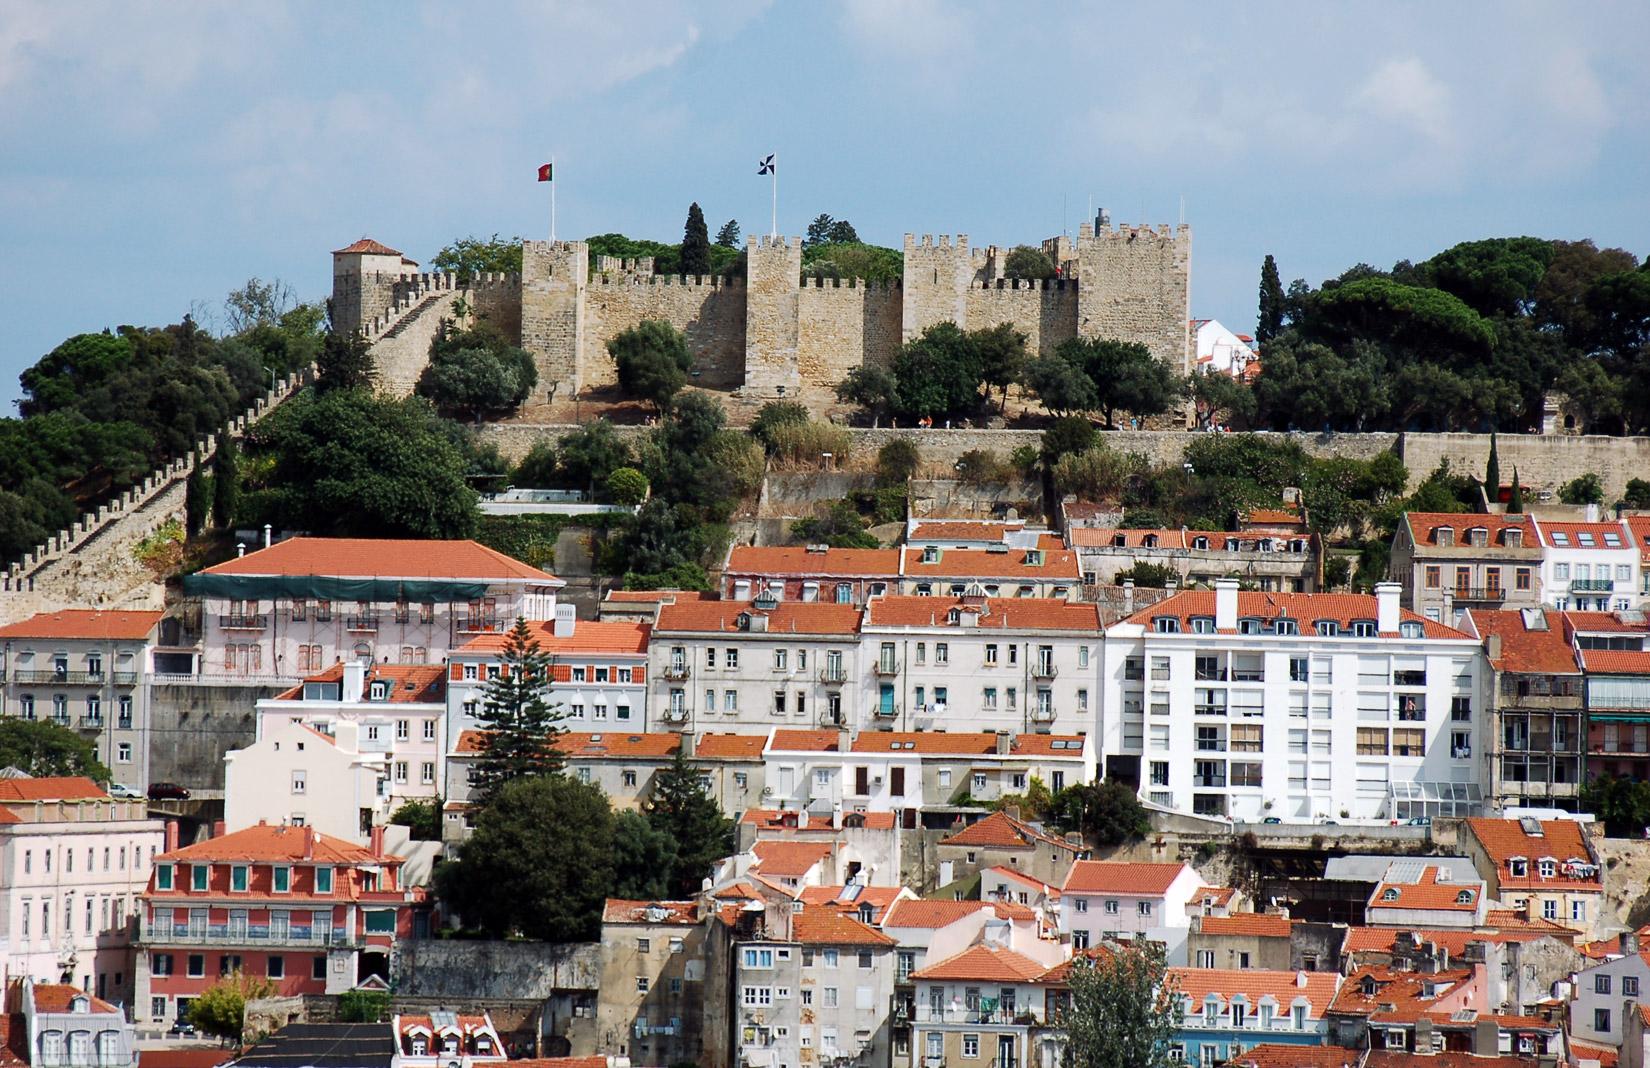 Sao Jorge Castle, Lisbon. Photography: Mstyslav Chernov